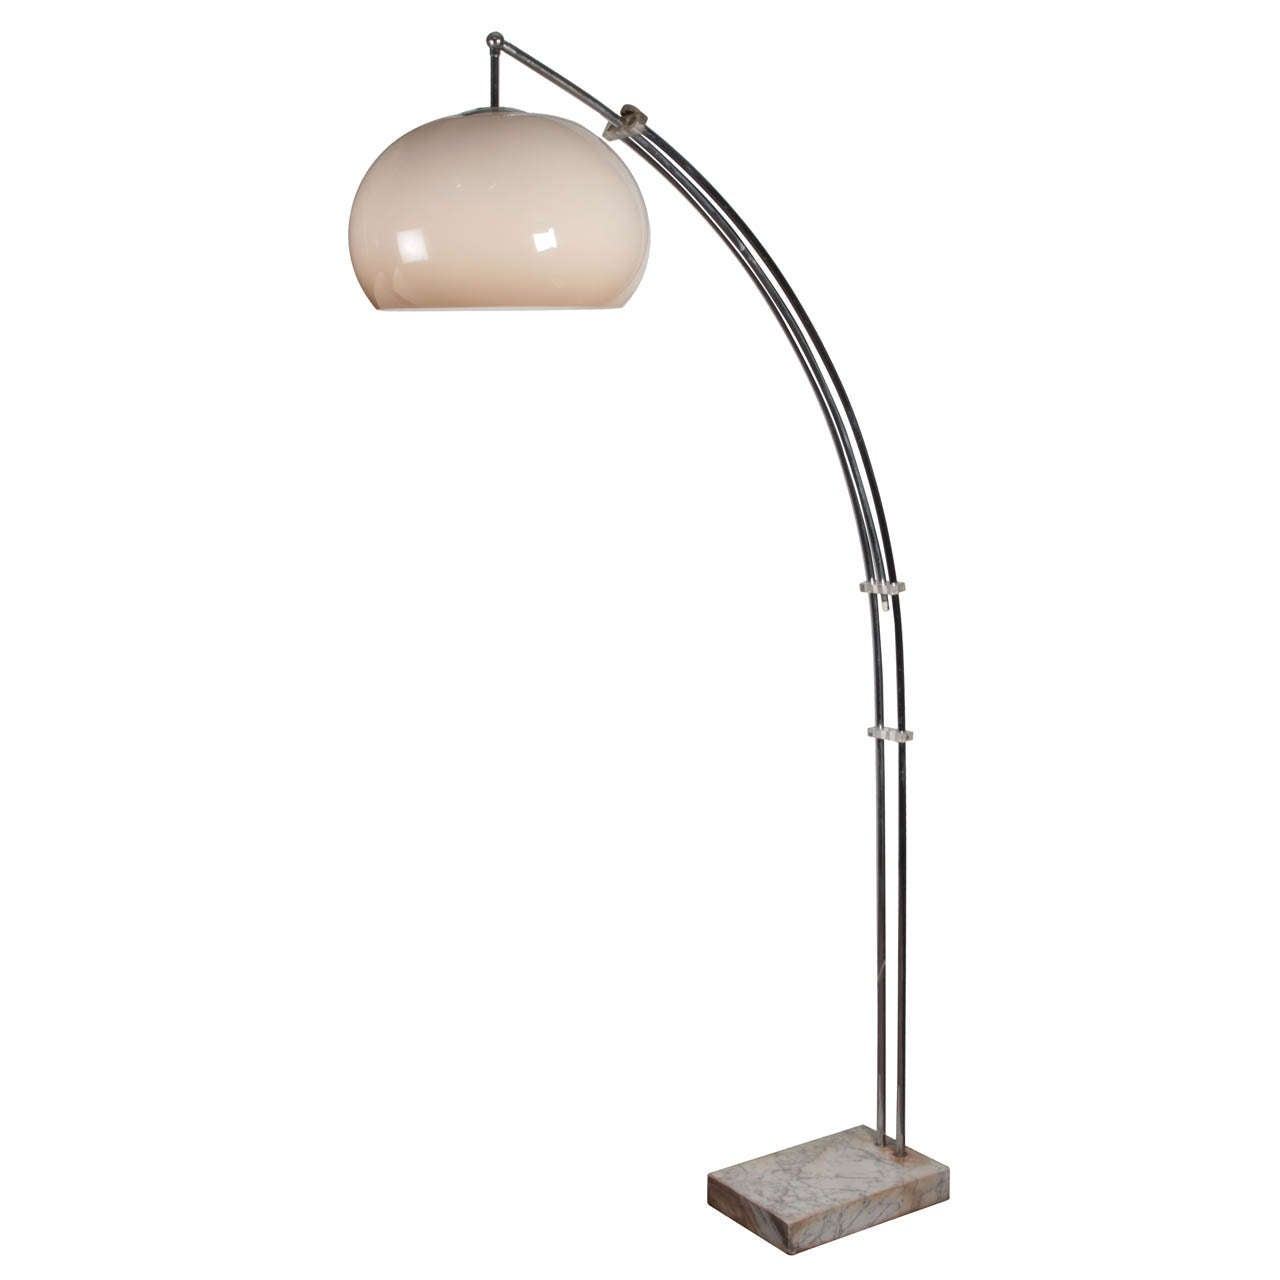 adjustable mid century arc floor lamp with original shade. Black Bedroom Furniture Sets. Home Design Ideas